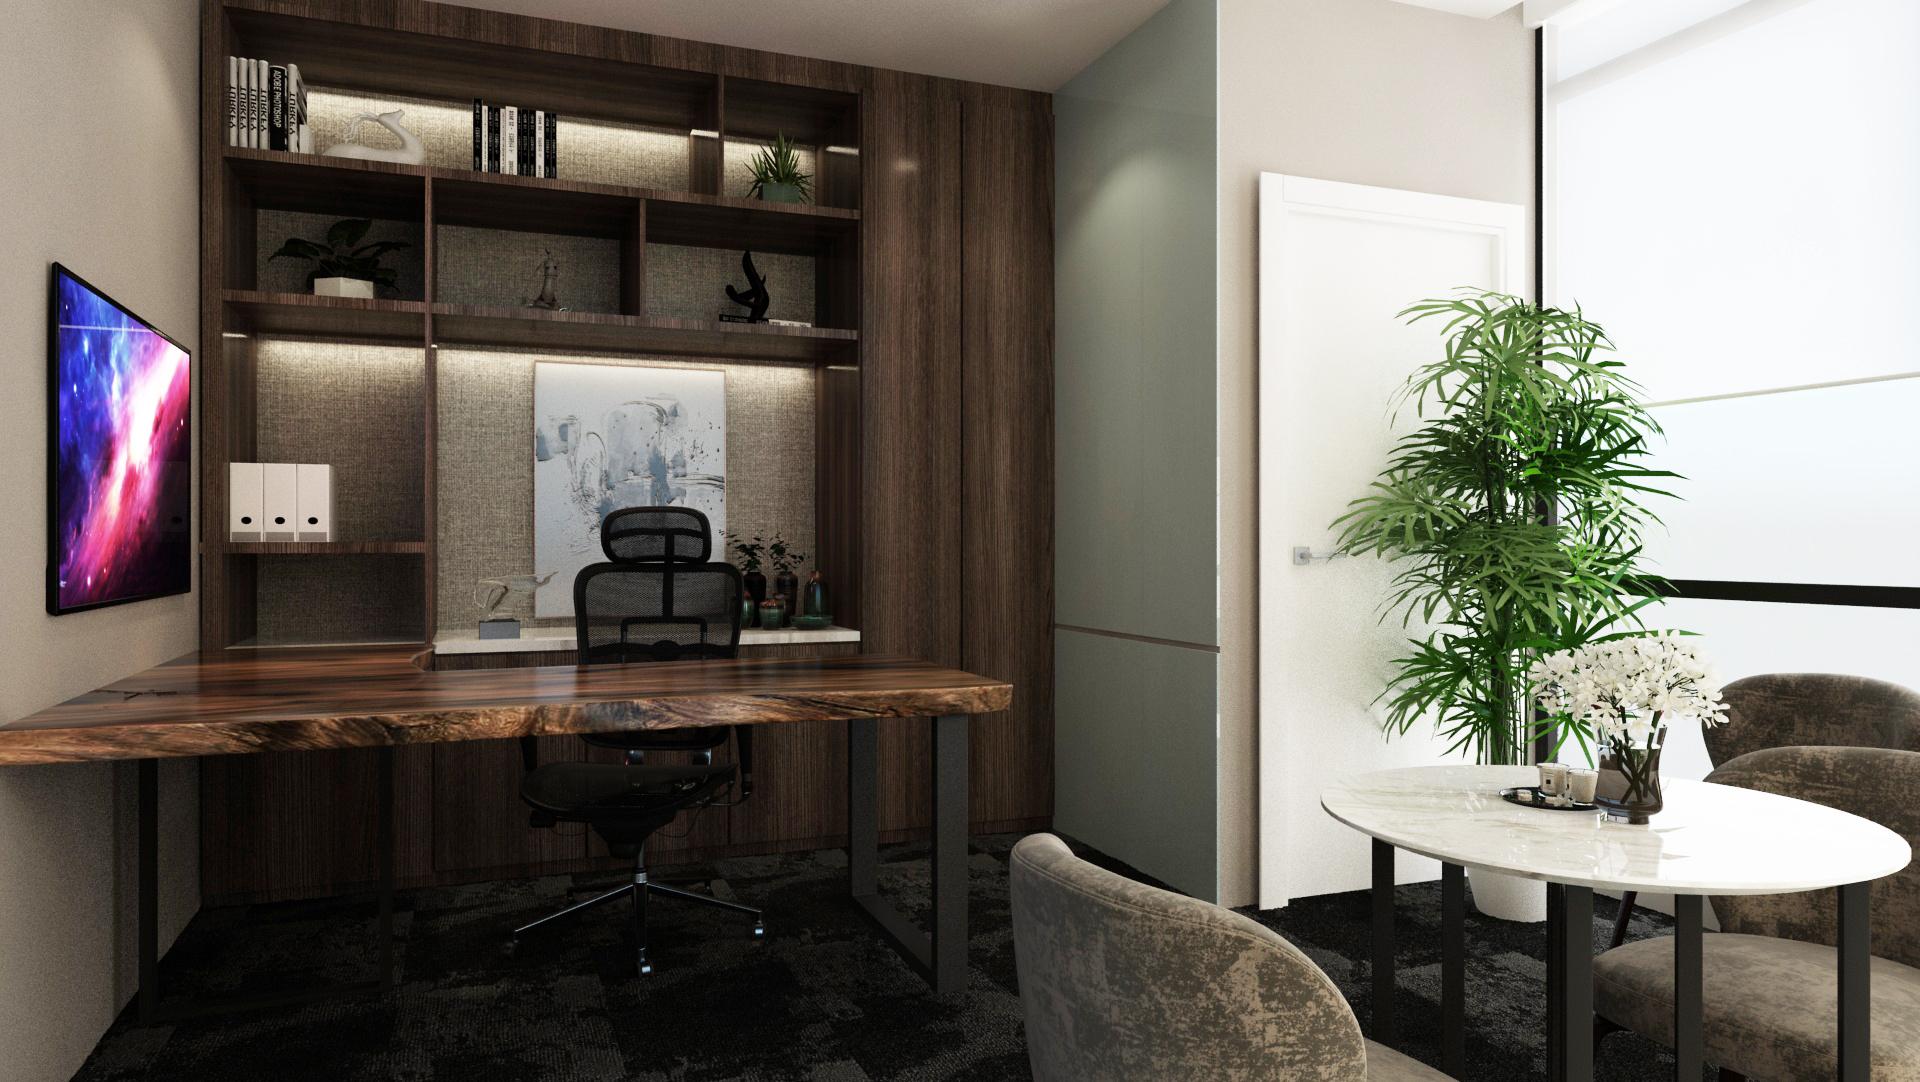 1_Manager;s Room.jpg